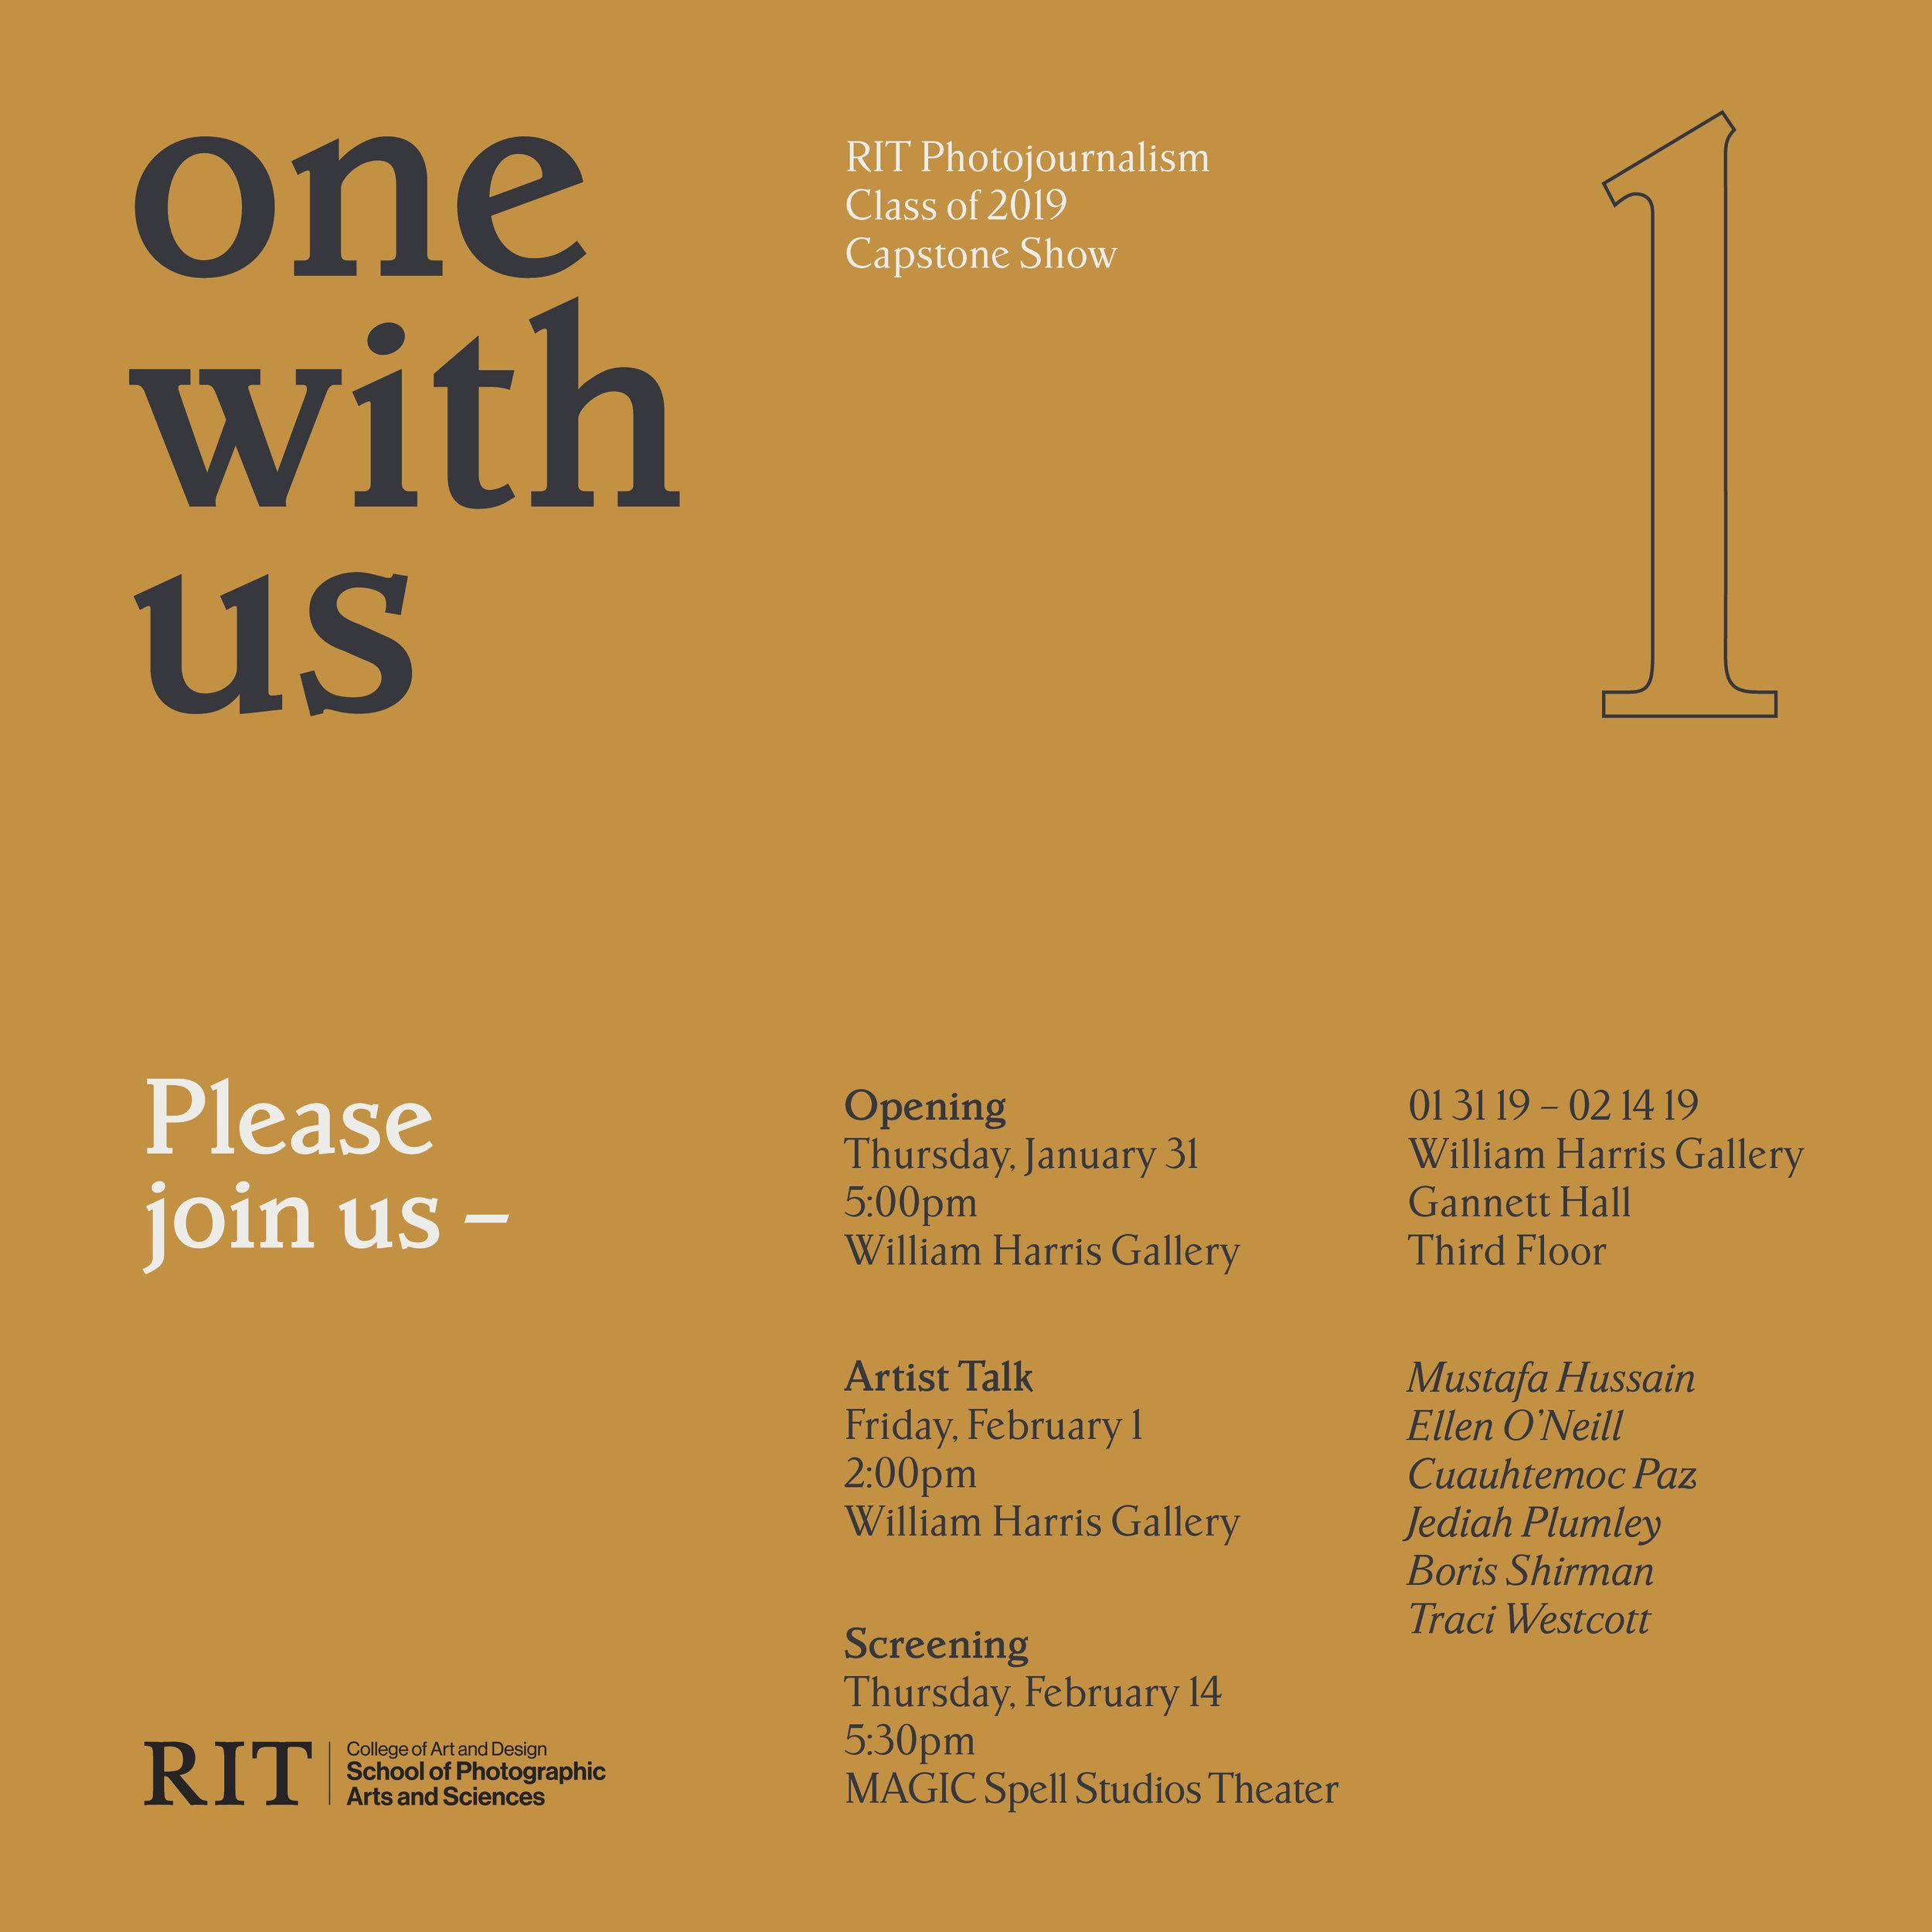 OneWithUs_final digital invite.jpg